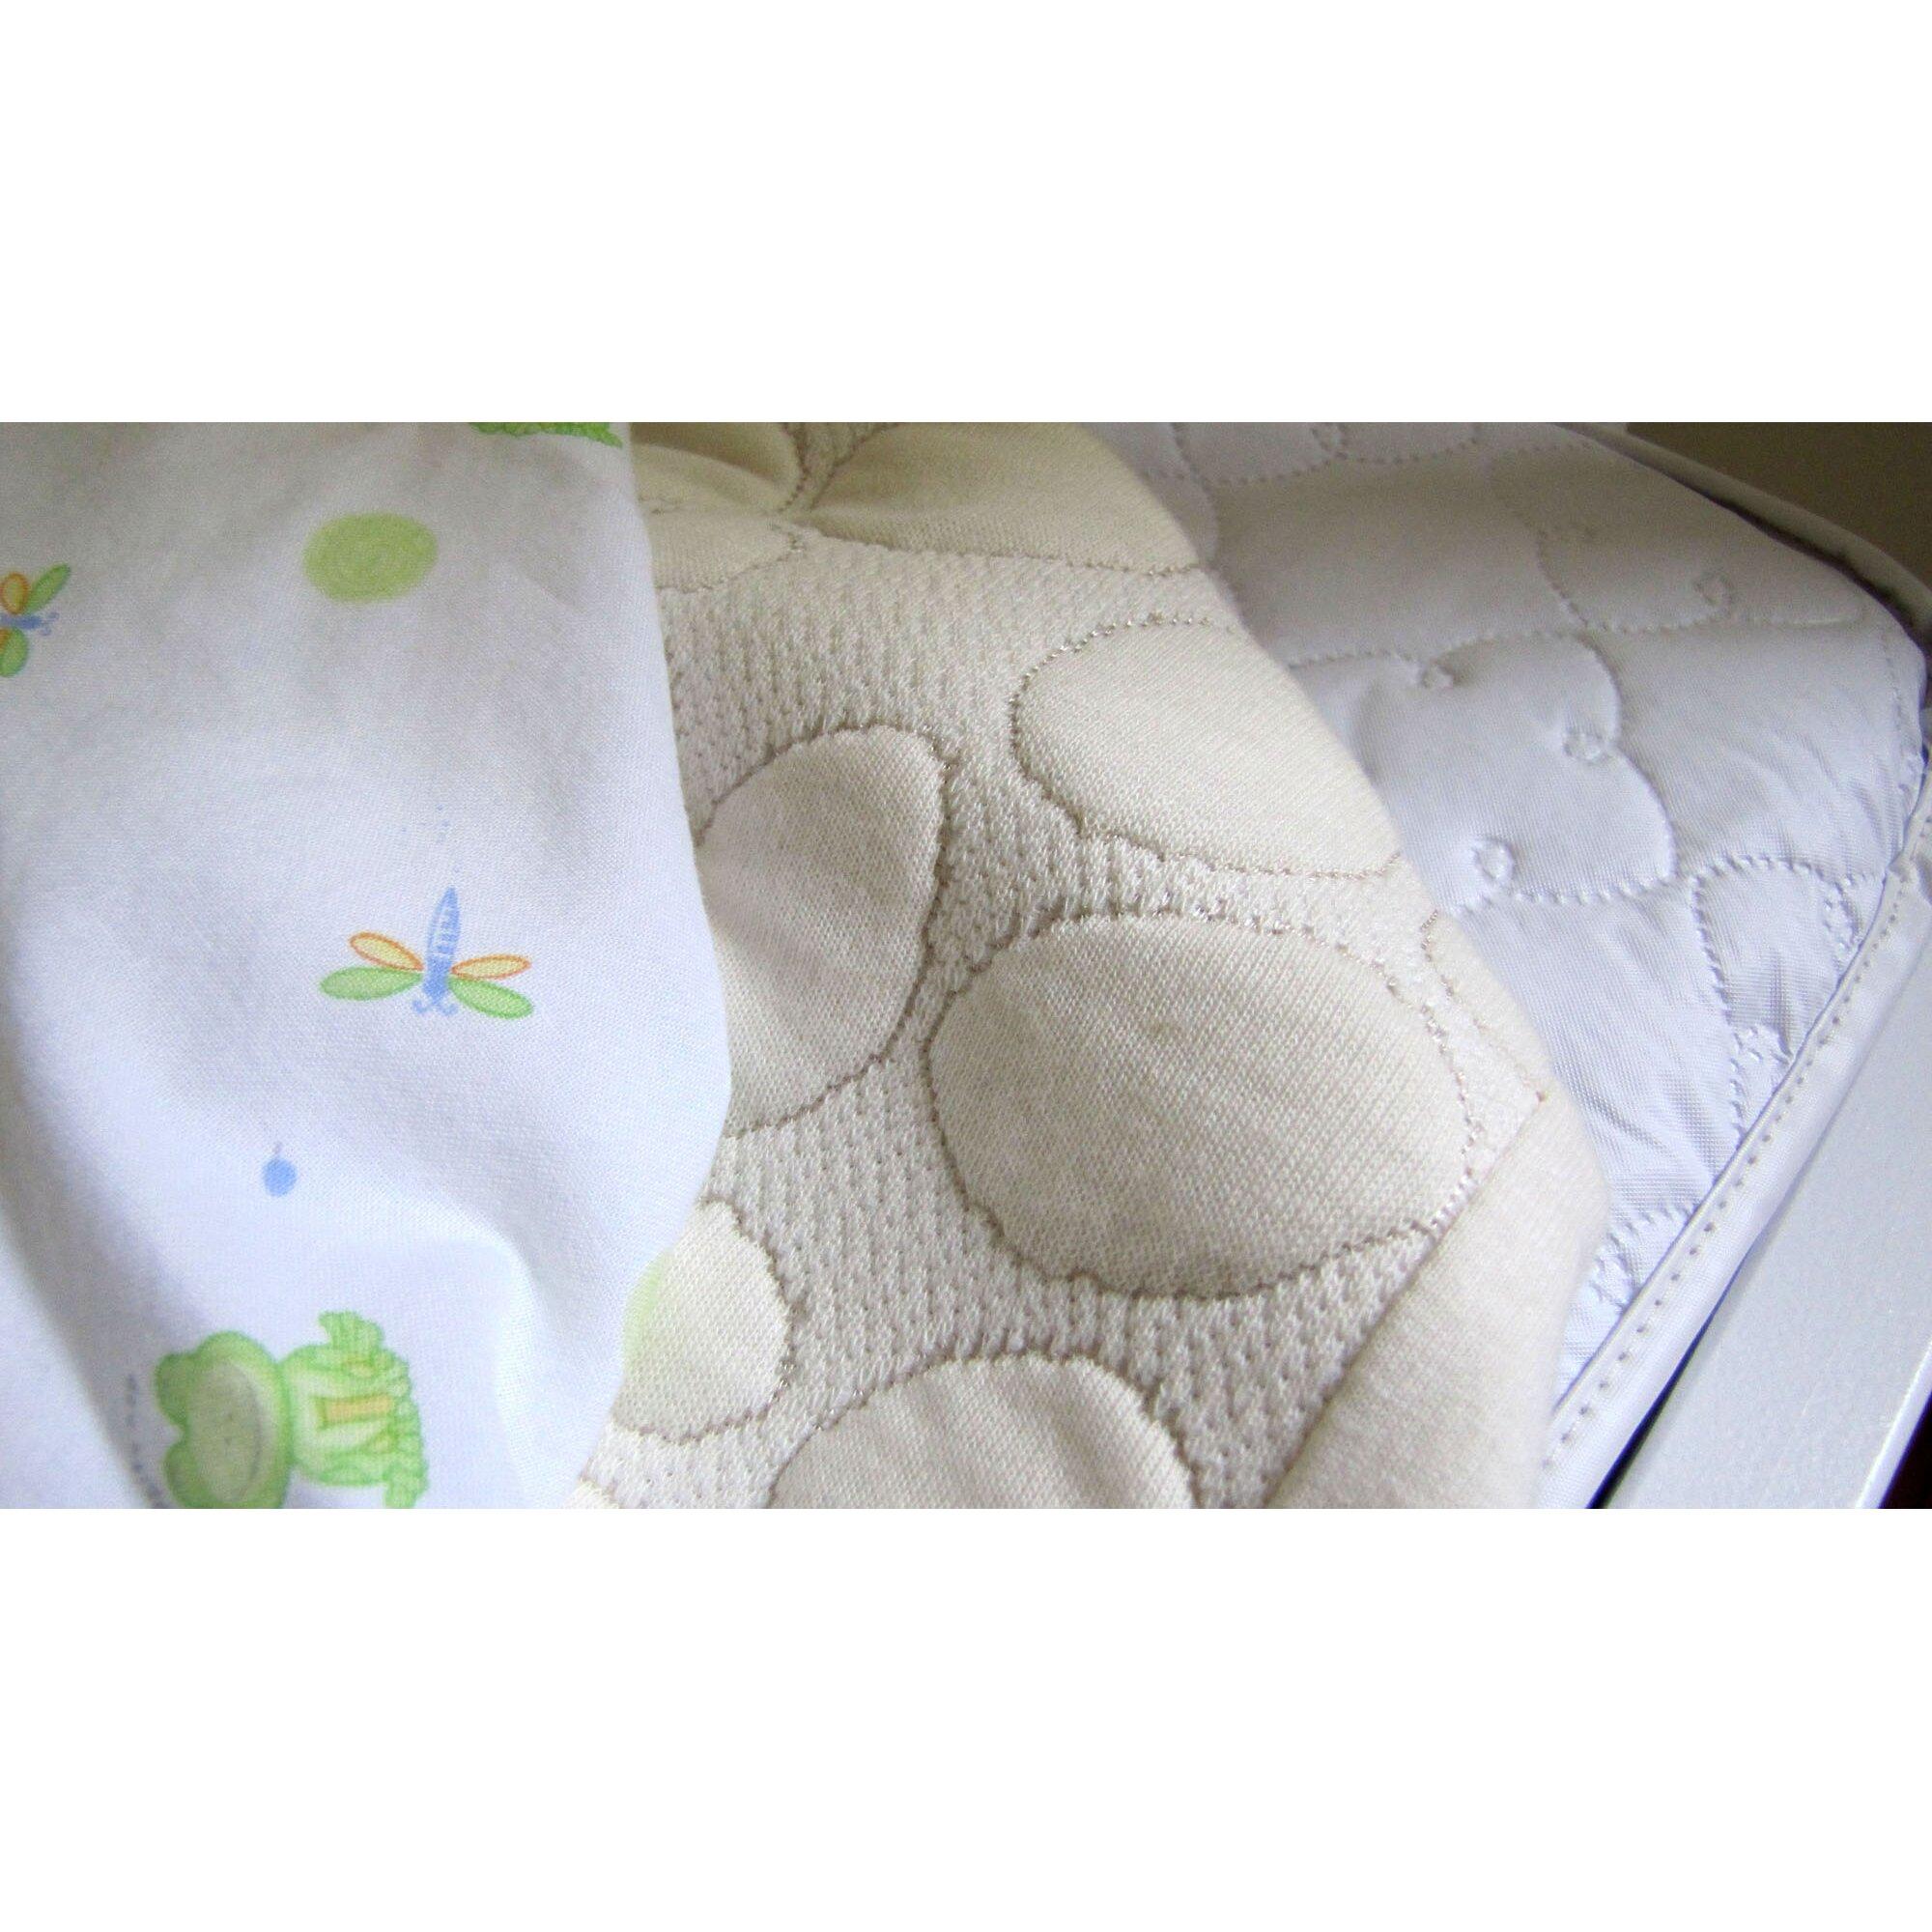 crib mattress cover crib mattress cover previous next crib mattress pad safety crib mattress cover